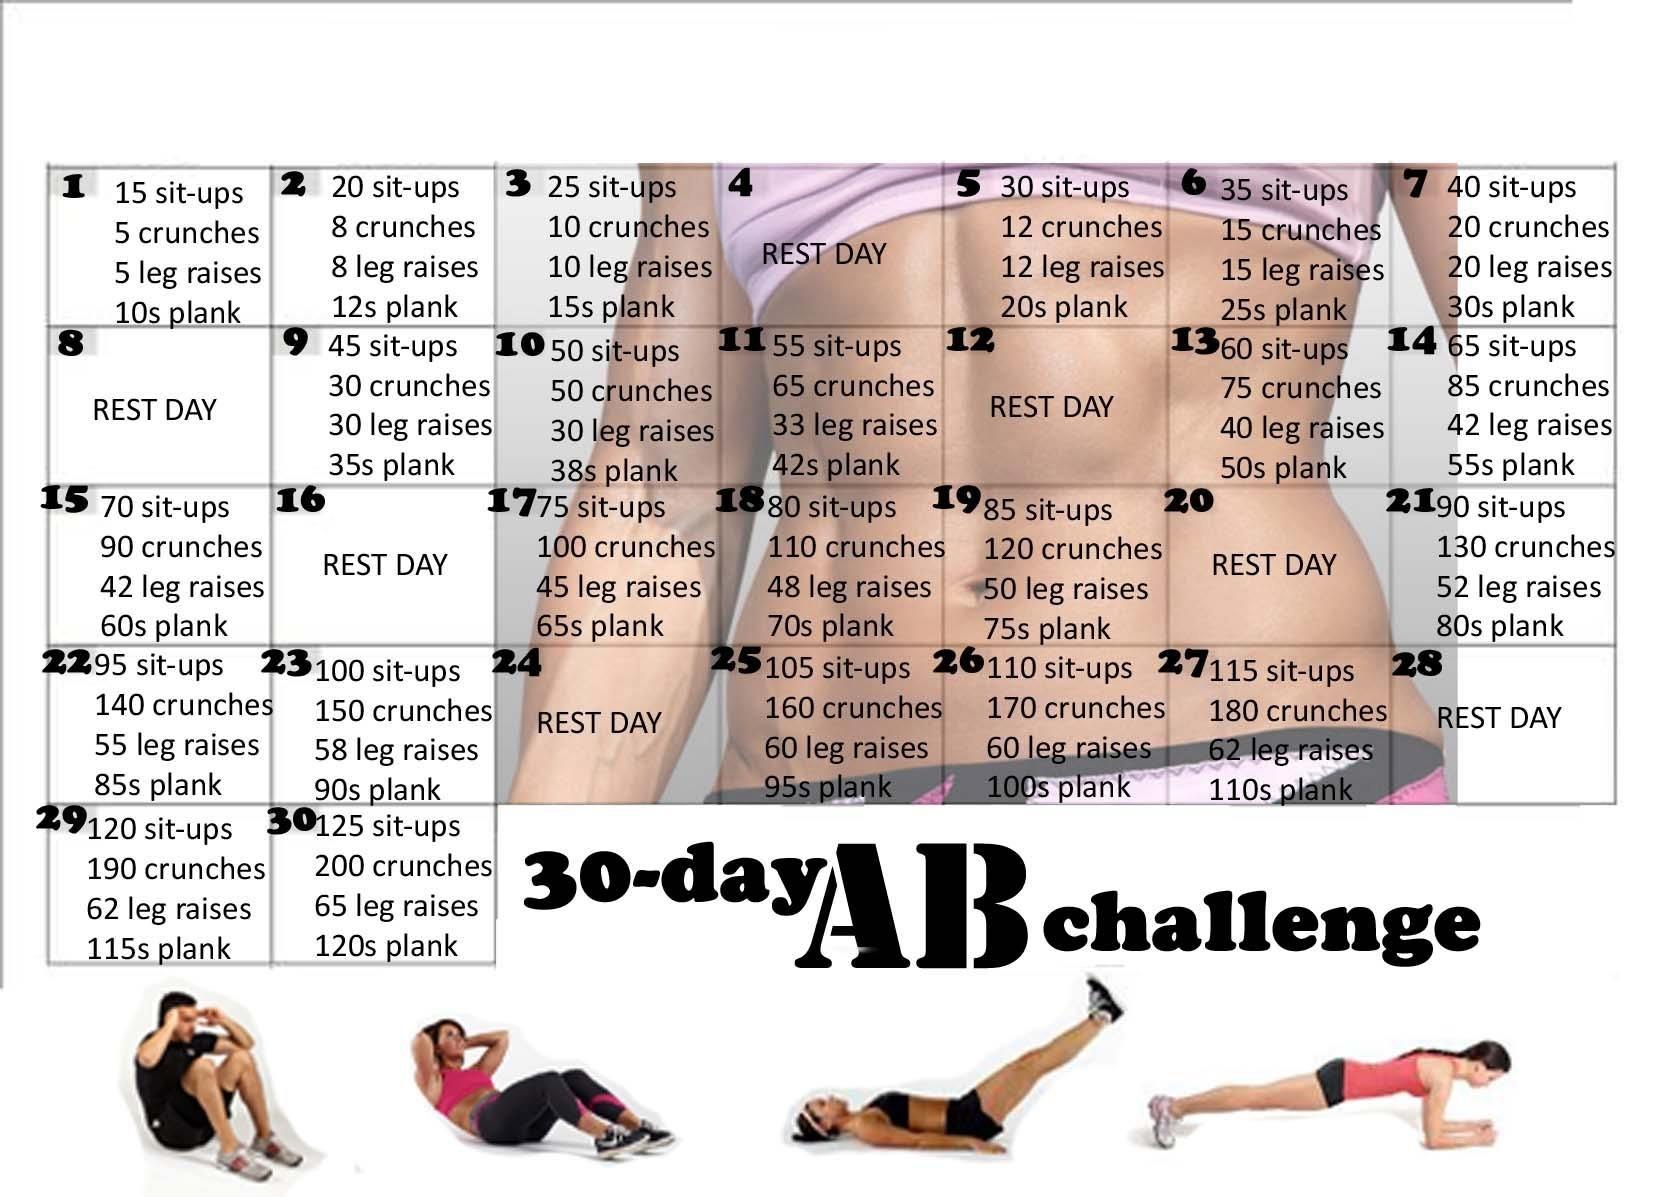 30 Day Ab Challenge | 30 Day Ab Challenge, 30 Day Abs, Ab